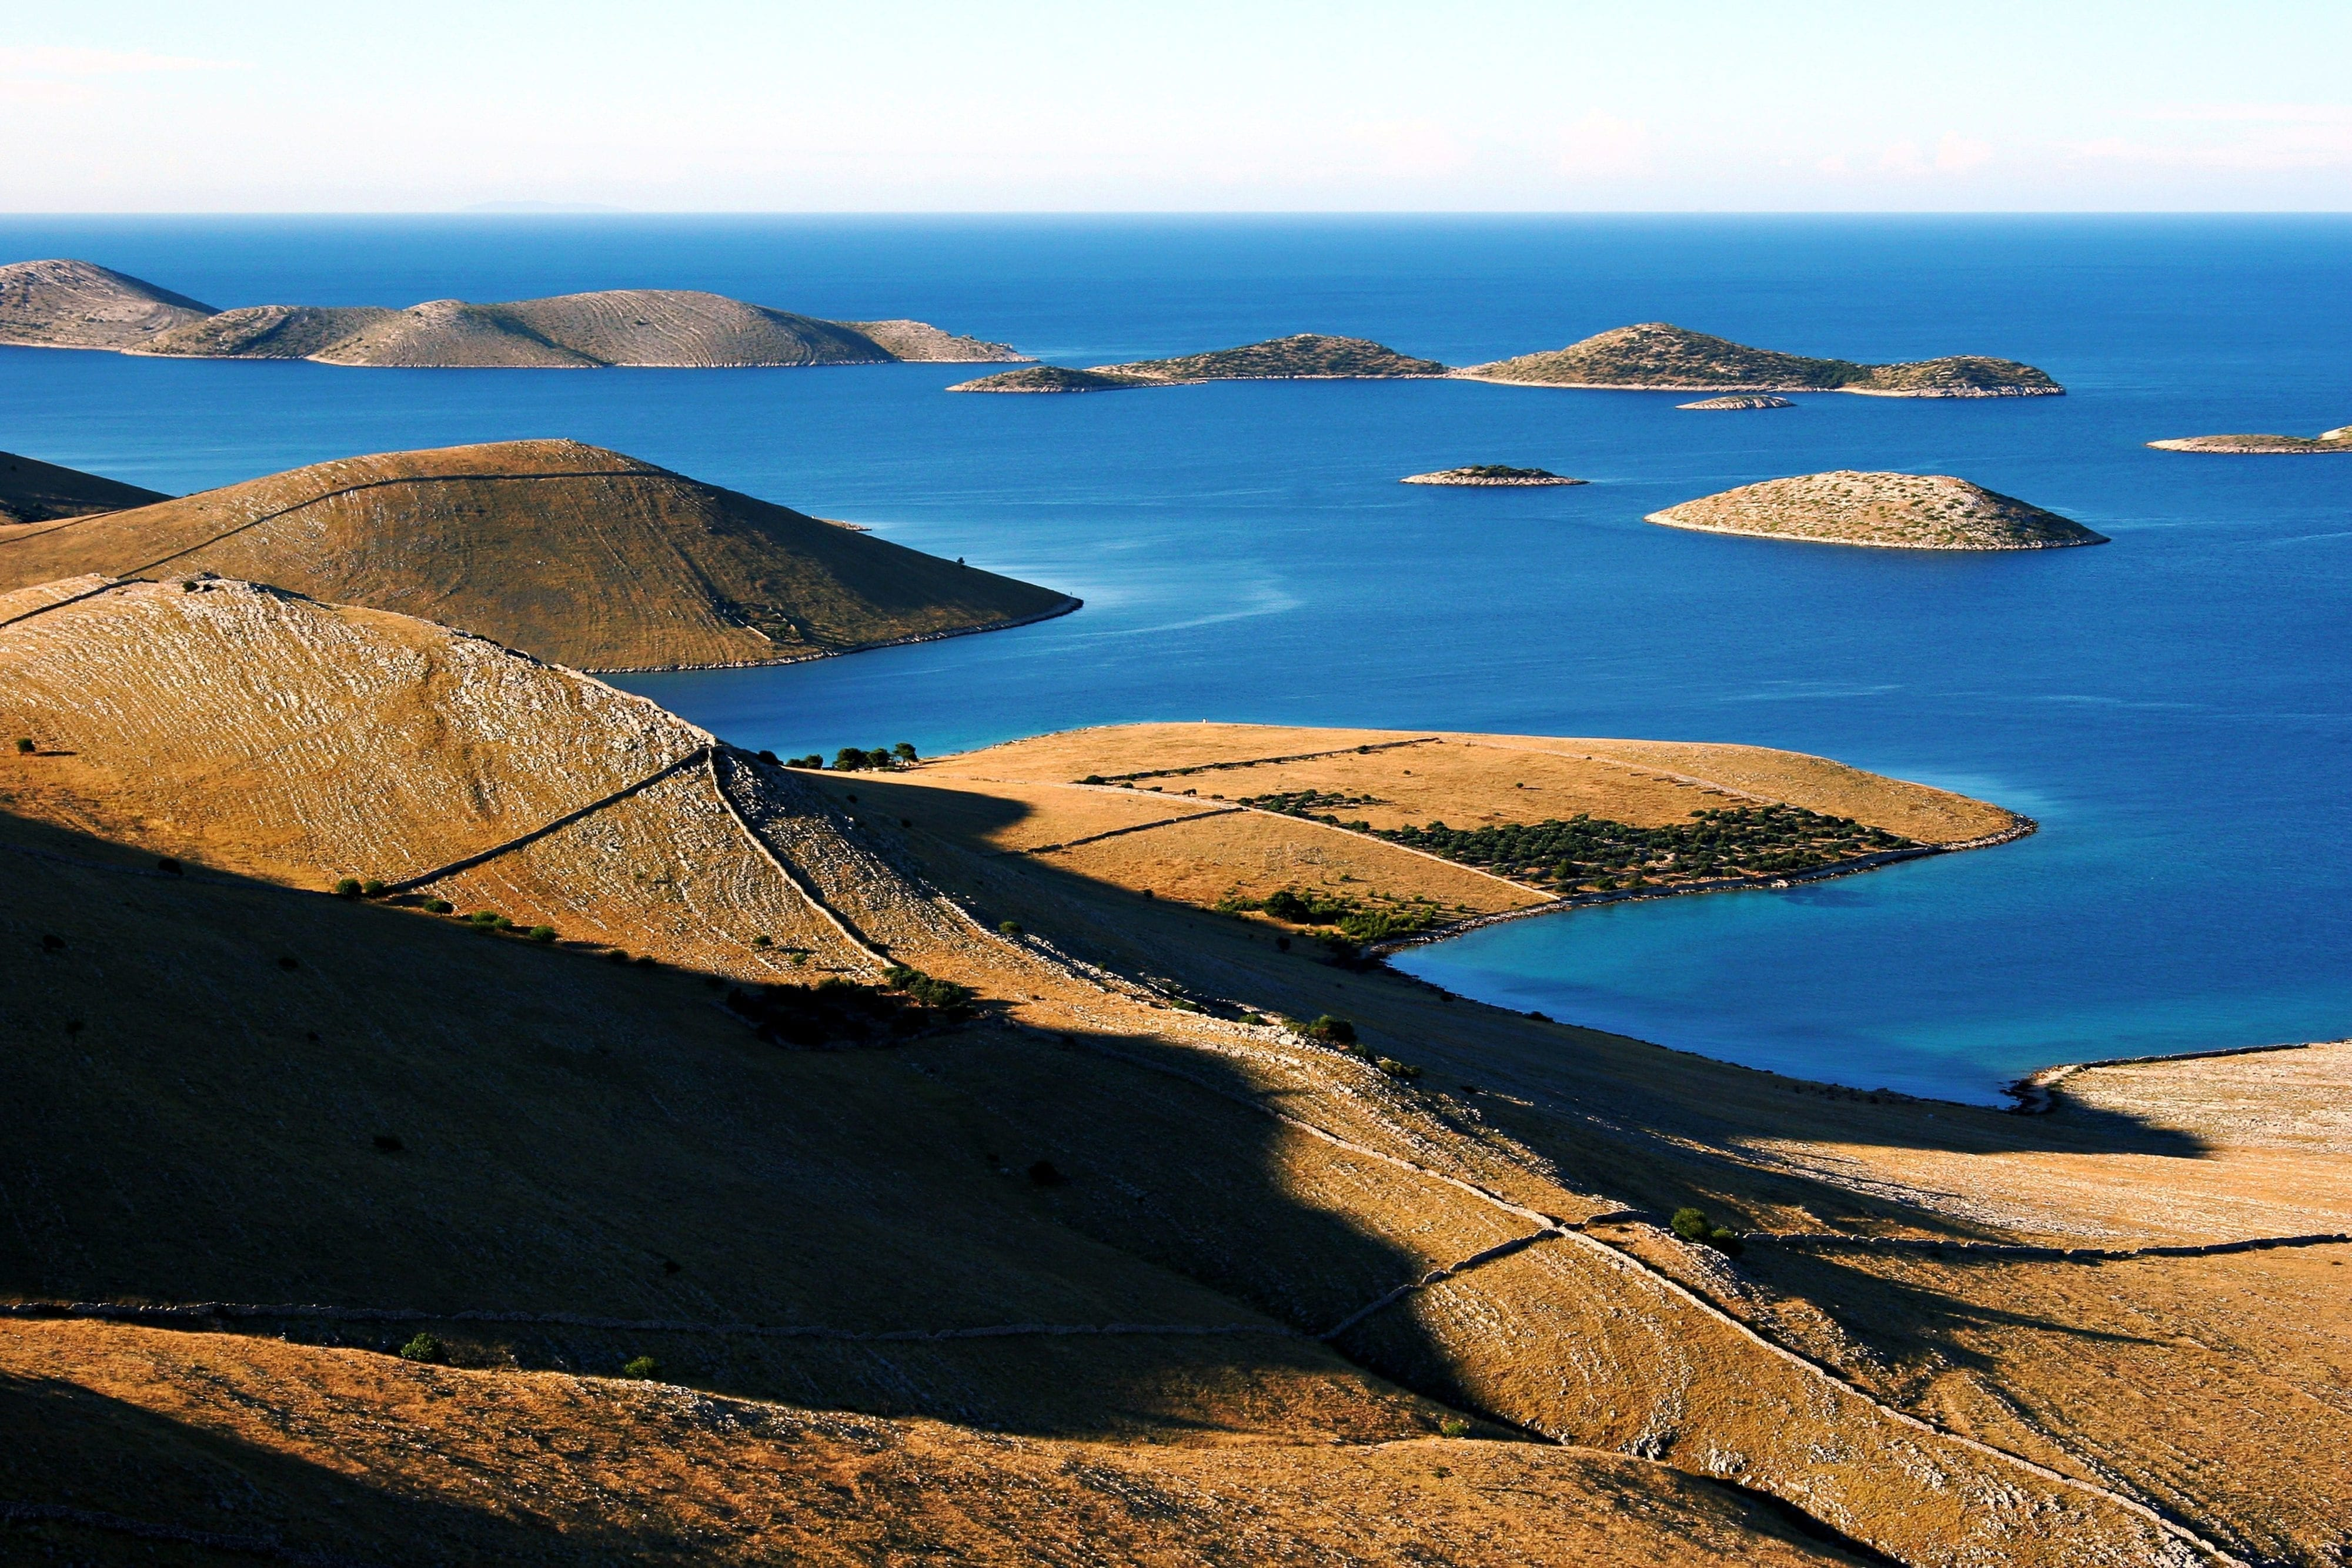 Kornati Islands, Croatia